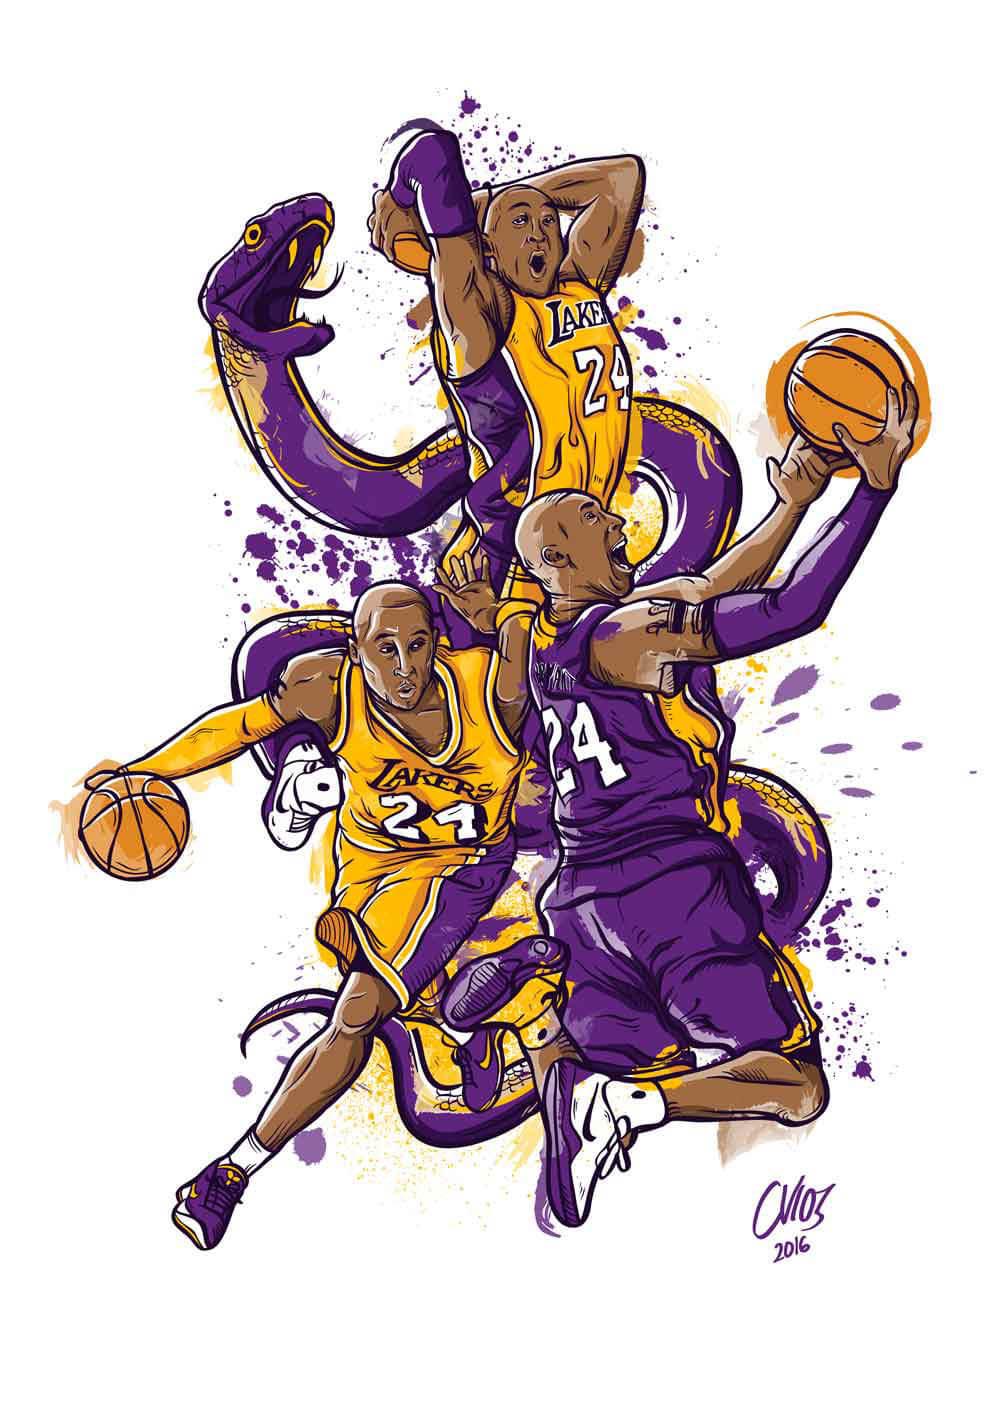 Cearlson Vios – Kobe Bryant